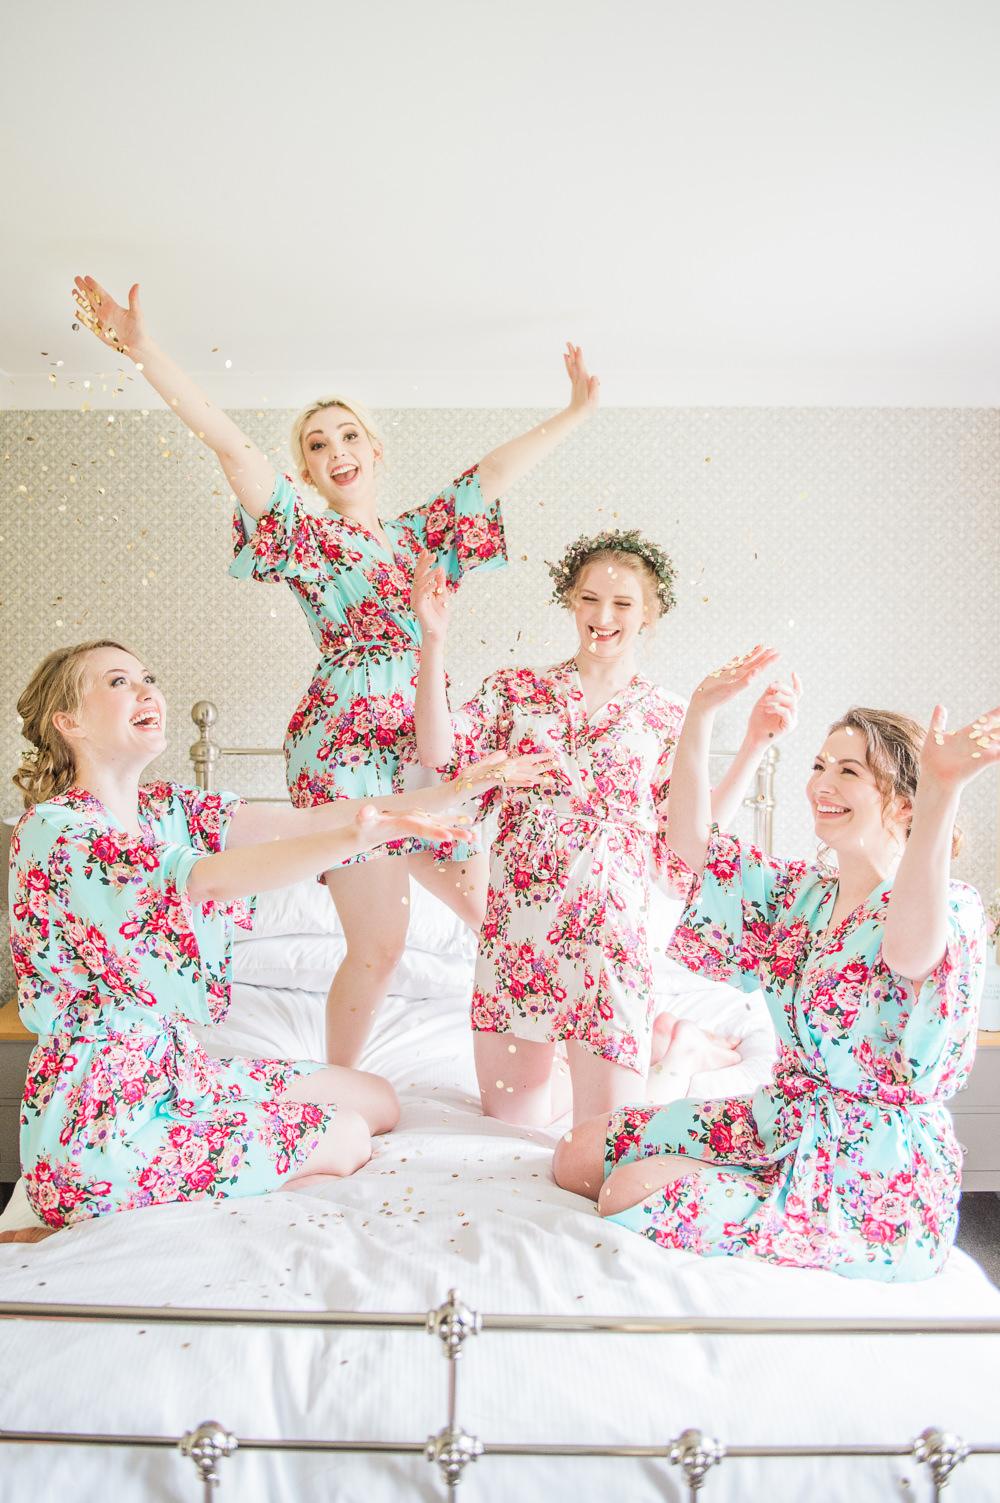 Bride Bridesmaids Dressing Gowns Robes Prep Glitter Confetti Springtime Bridal Shower Ideas Hen Party Laura Jane Photography